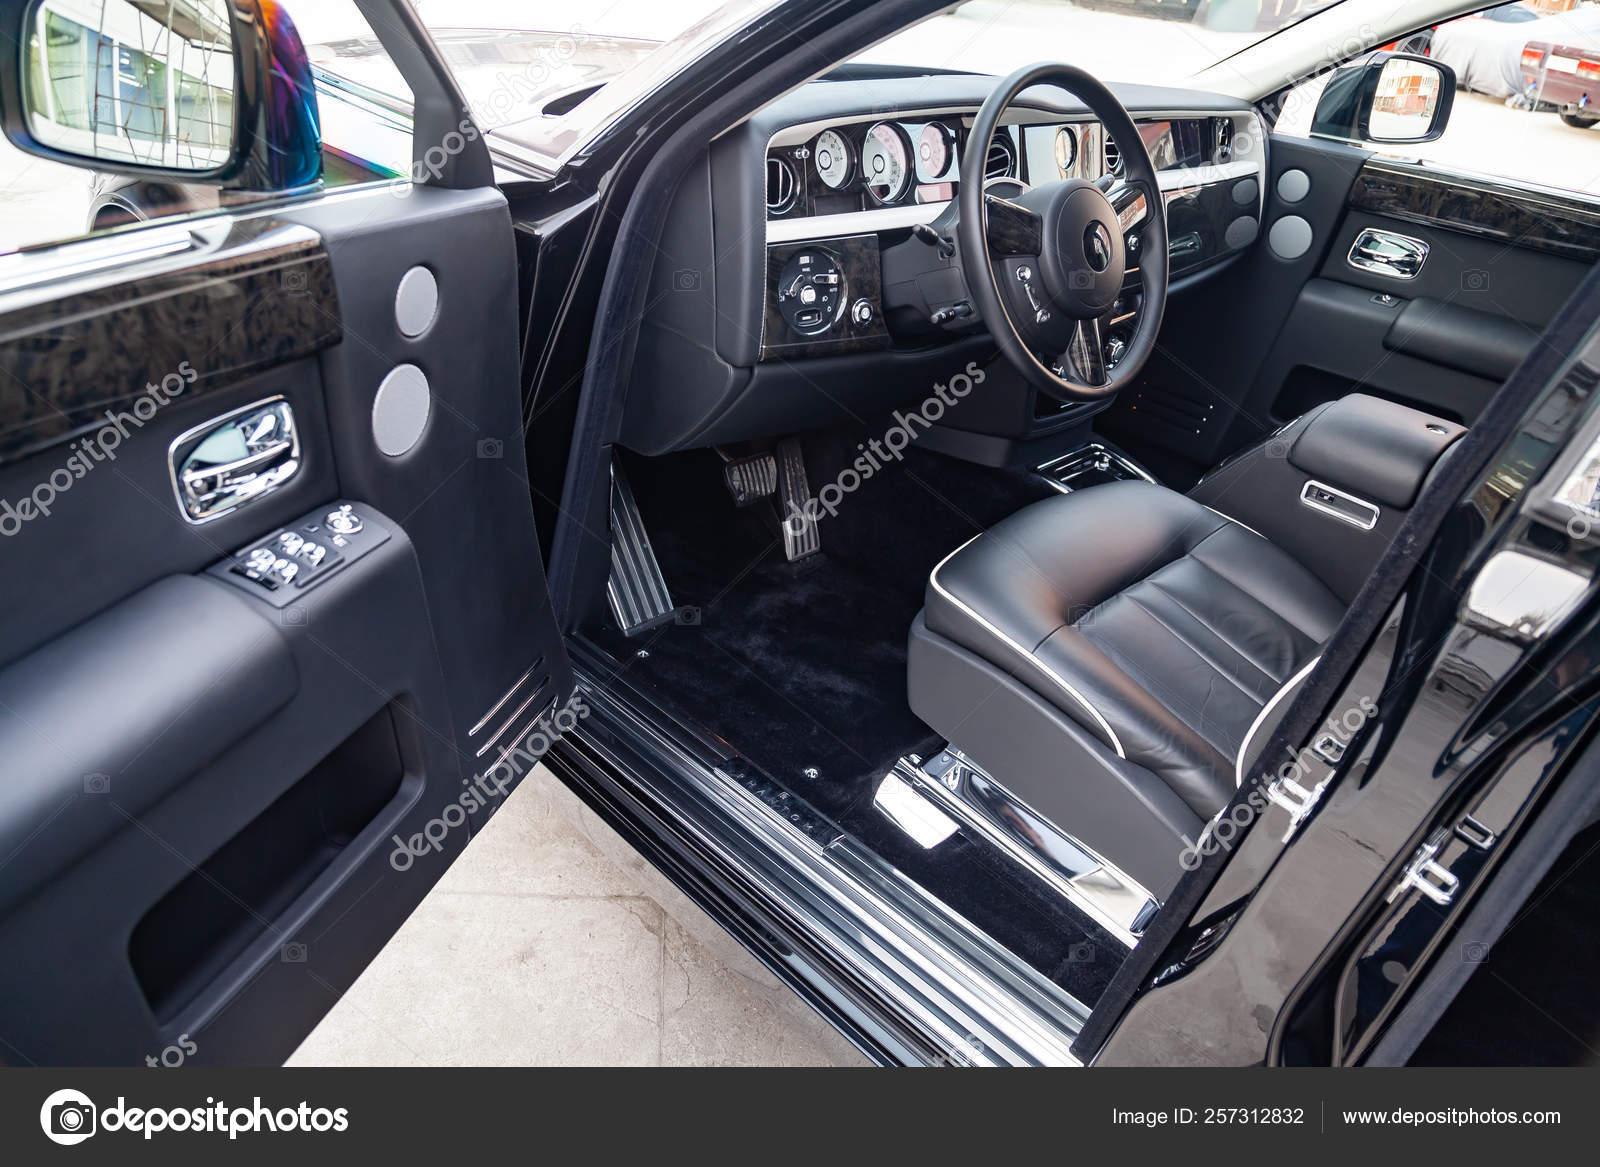 Interior View Of New A Very Expensive Rolls Royce Phantom Car A Stock Editorial Photo C Aleksandrkondratov 257312832